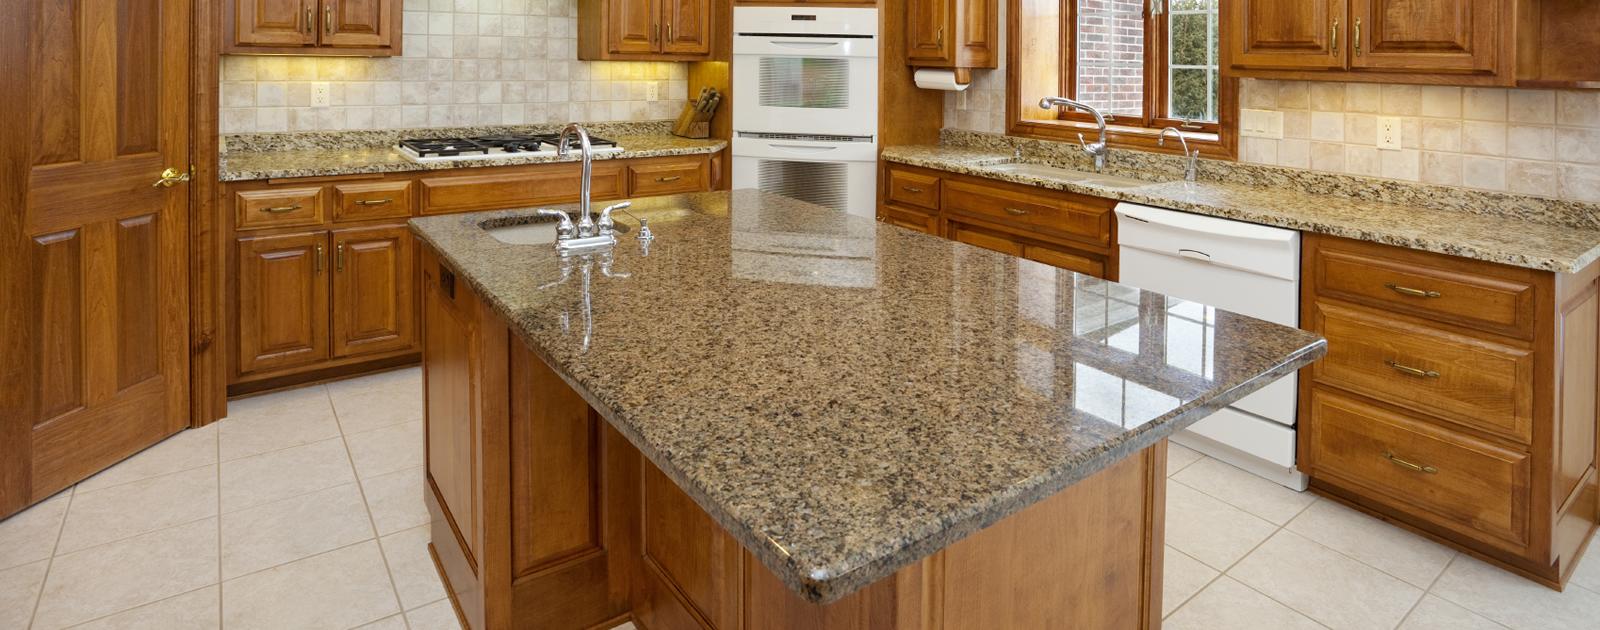 granite kitchen countertops cost nature s stone granite quality granite countertops